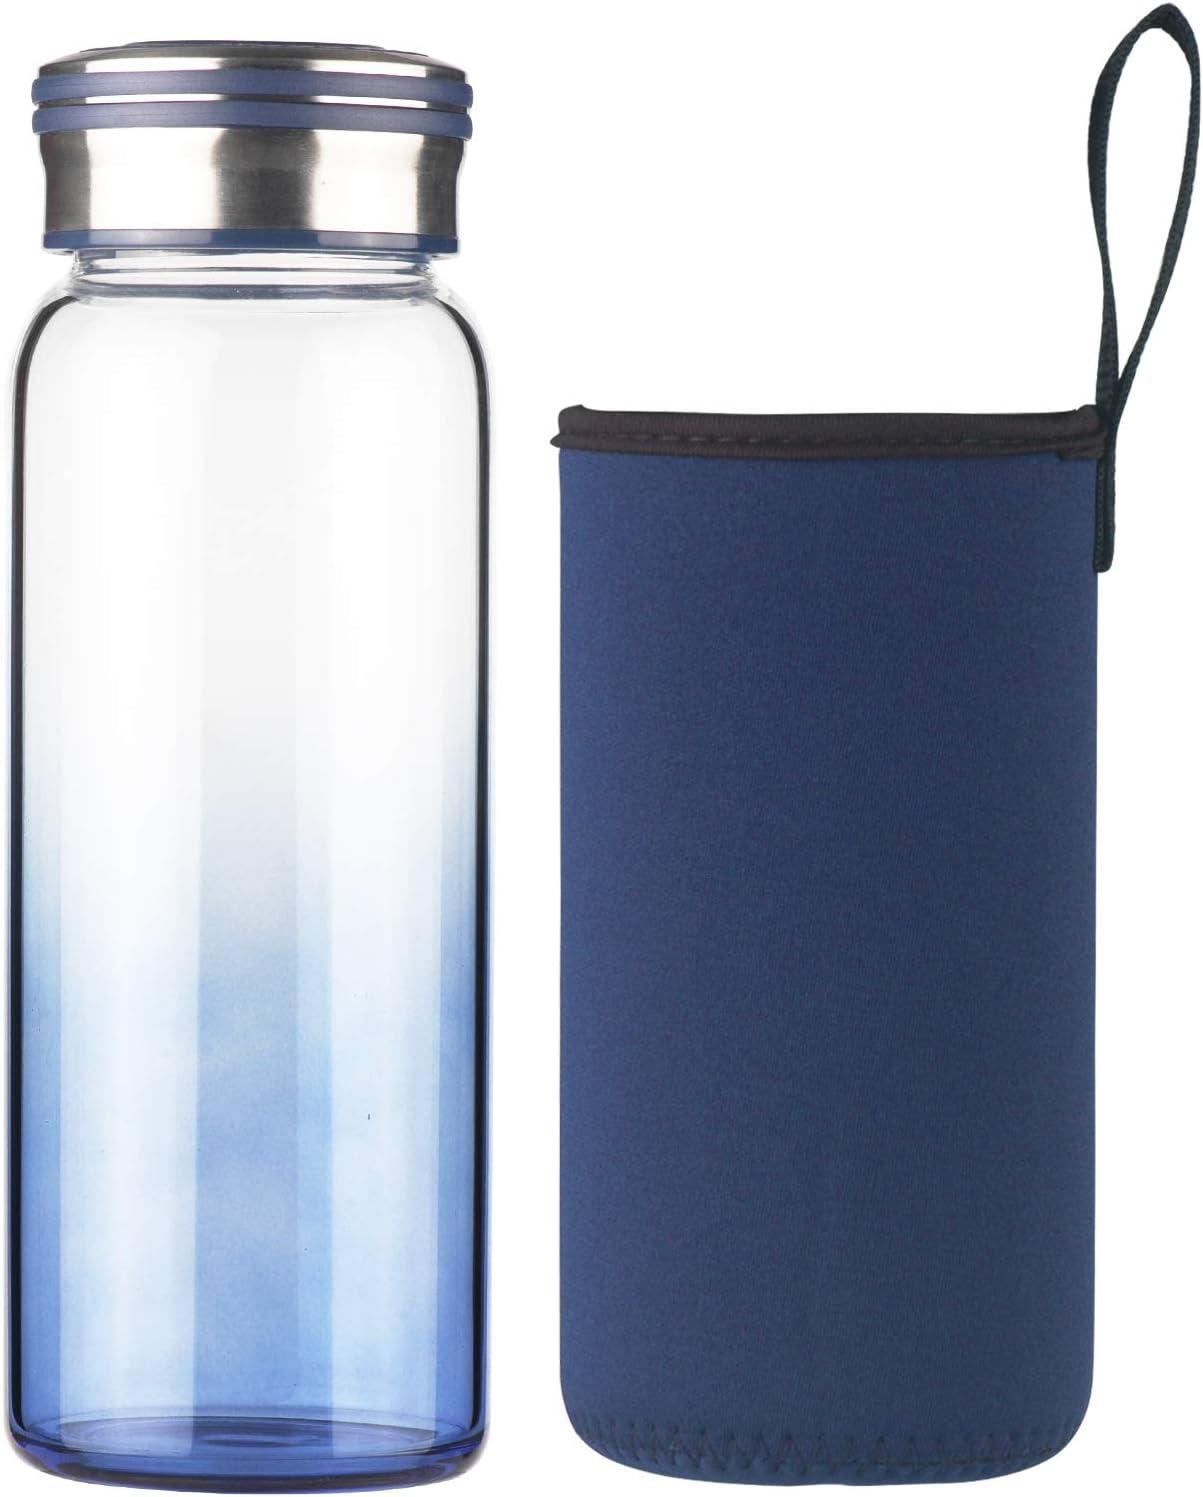 Cleesmil Botella de Agua de Cristal 750 ml / 1000 ml / 1 litro Botella de Agua de Vidrio Deportiva con Funda de Neopreno sin BPA